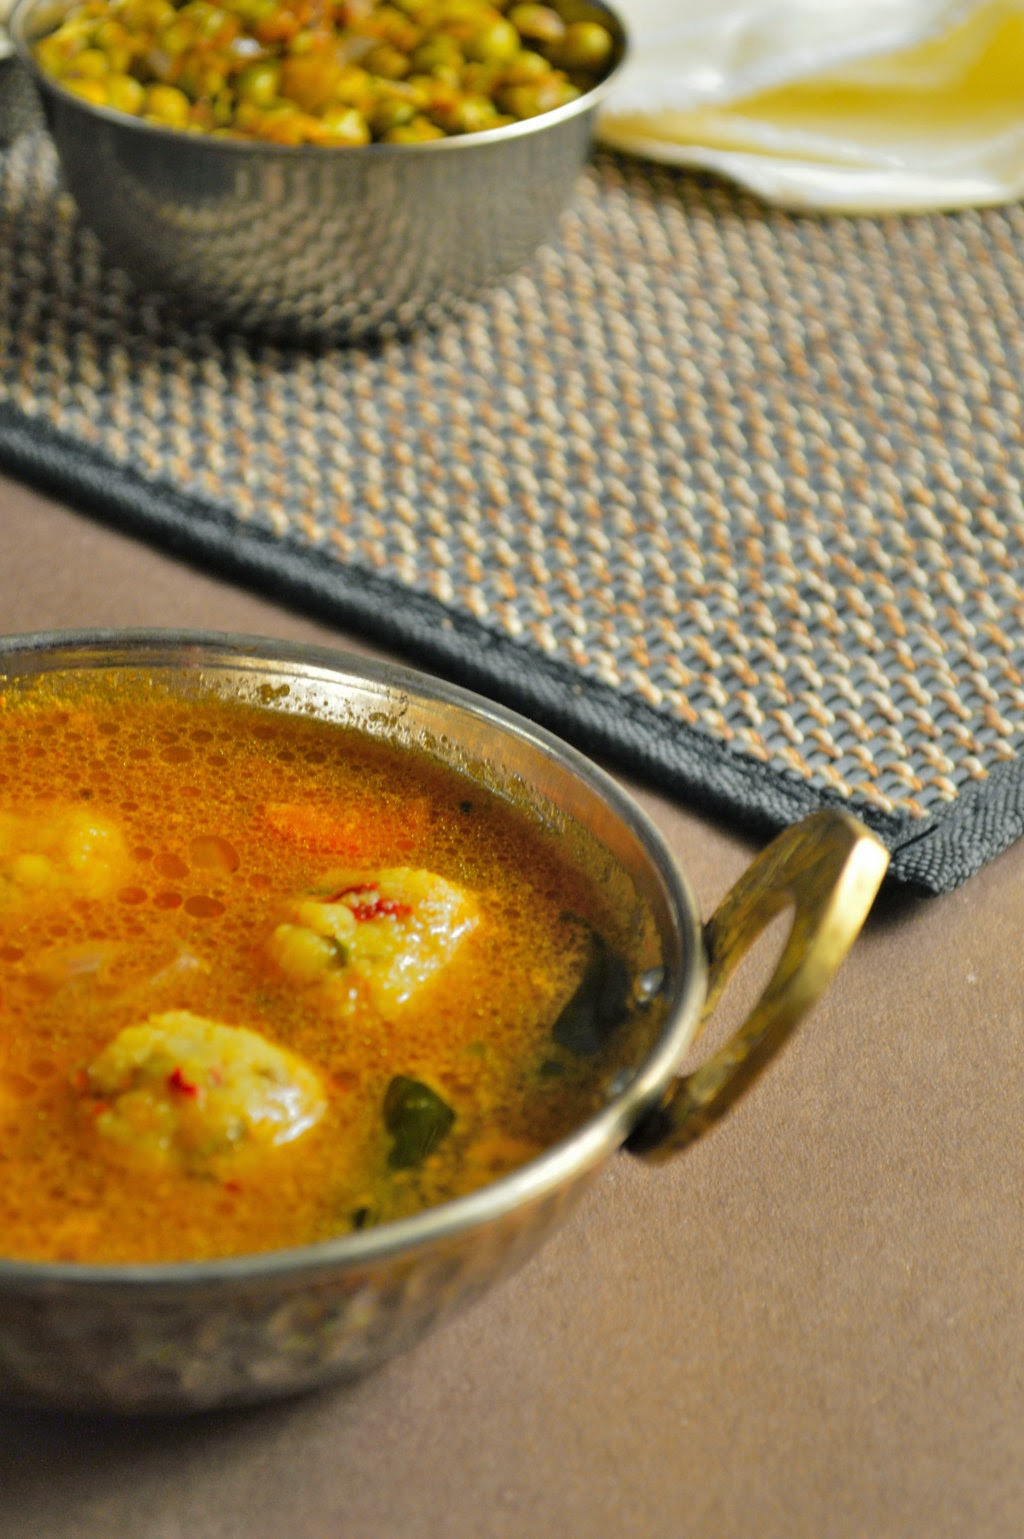 kola urundai kuzhambu, Kuzhambu Recipes, Lunch Curries Recipes, urundai kulambu recipe, how to make urunda kuzhambu recipe, step by step pictures, kola urundai kuzhambu recipe